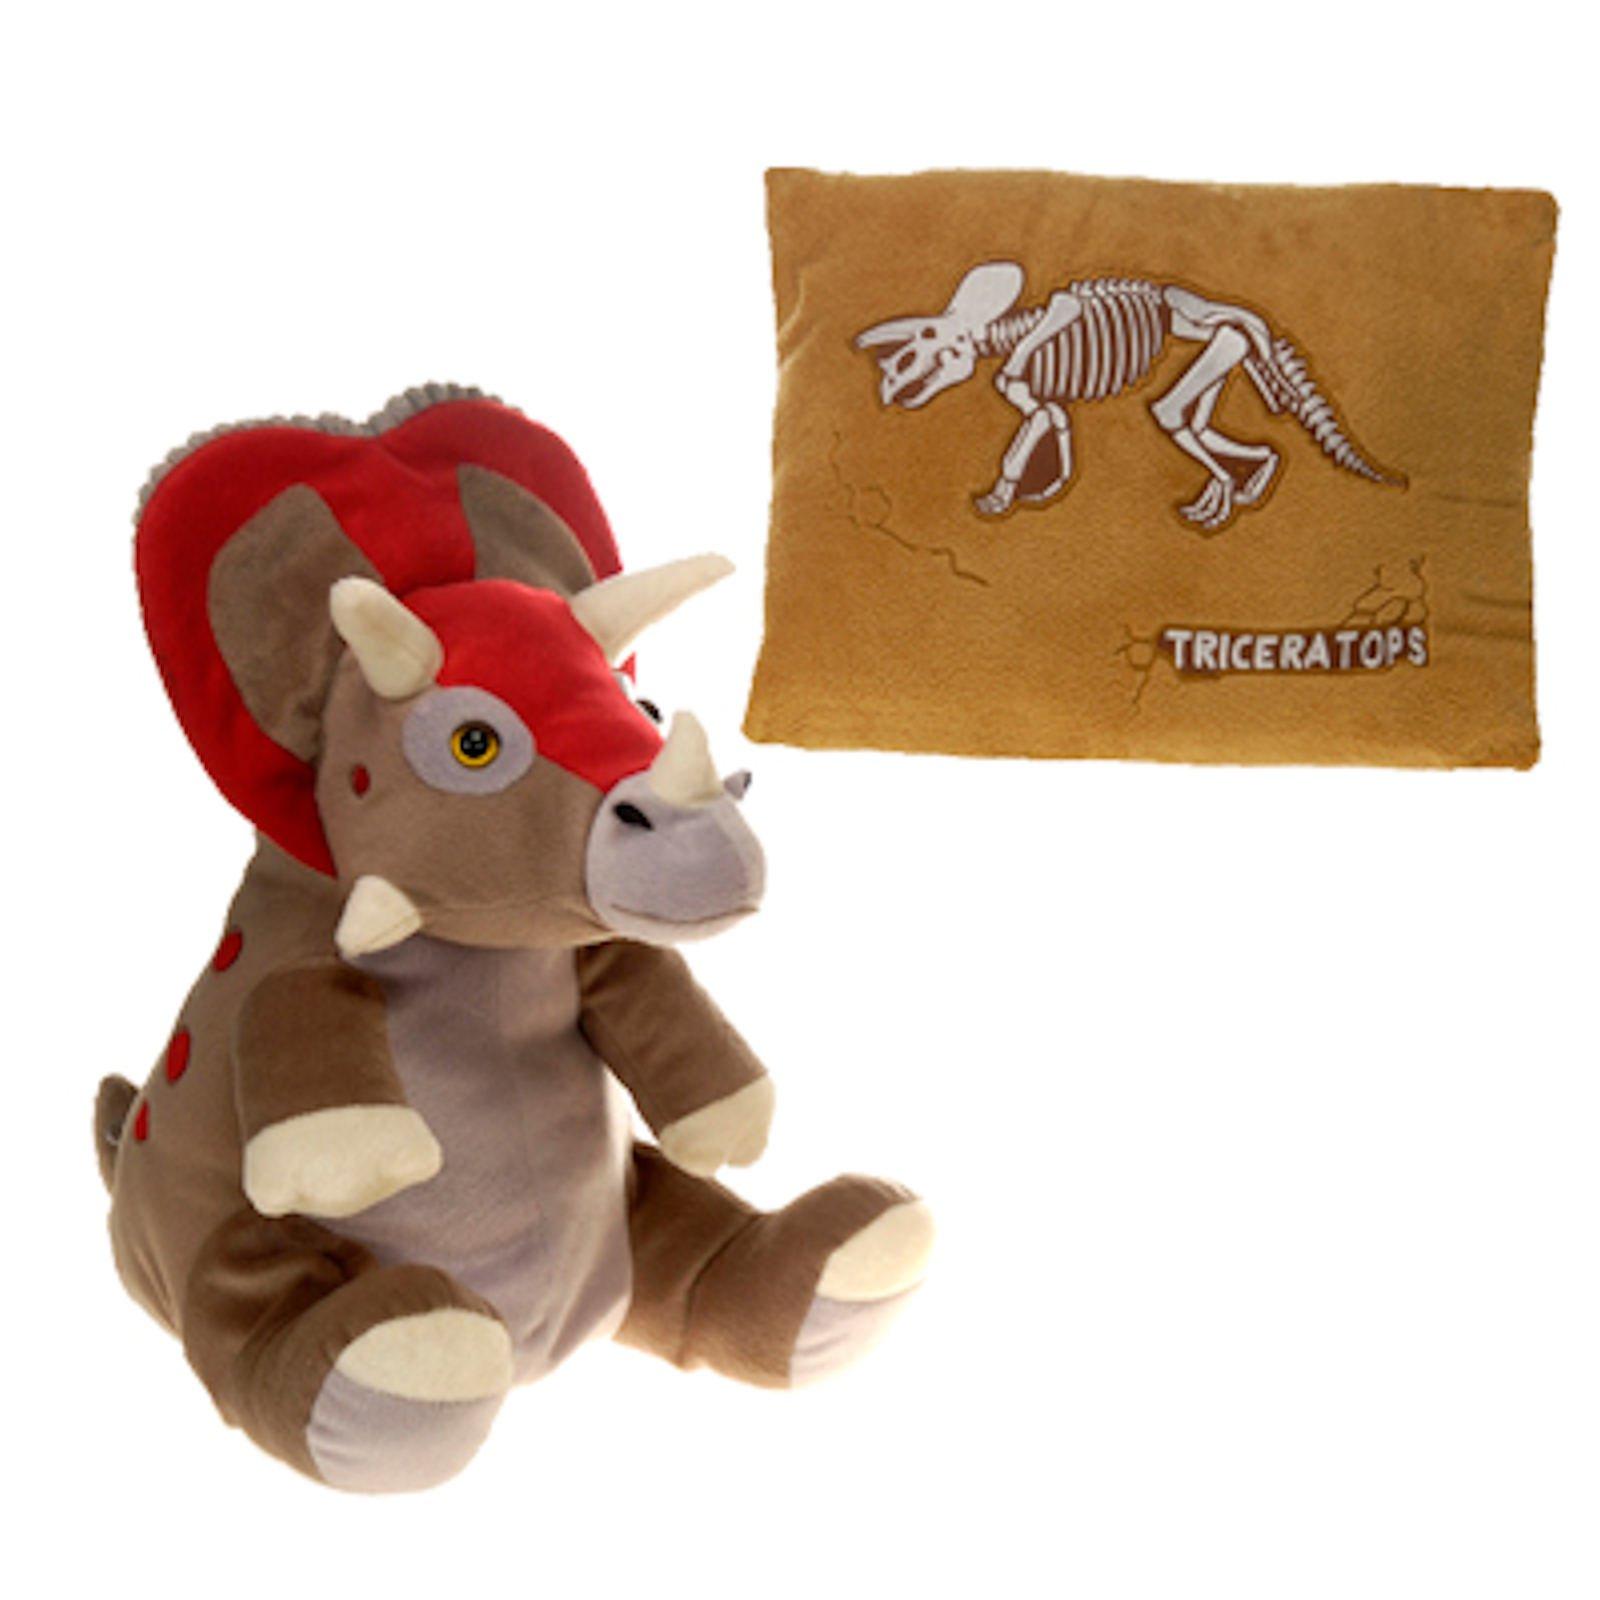 Fiesta Toys Peek-a-Boo Plush Pillow 2 in 1-13'' Triceratops Animals